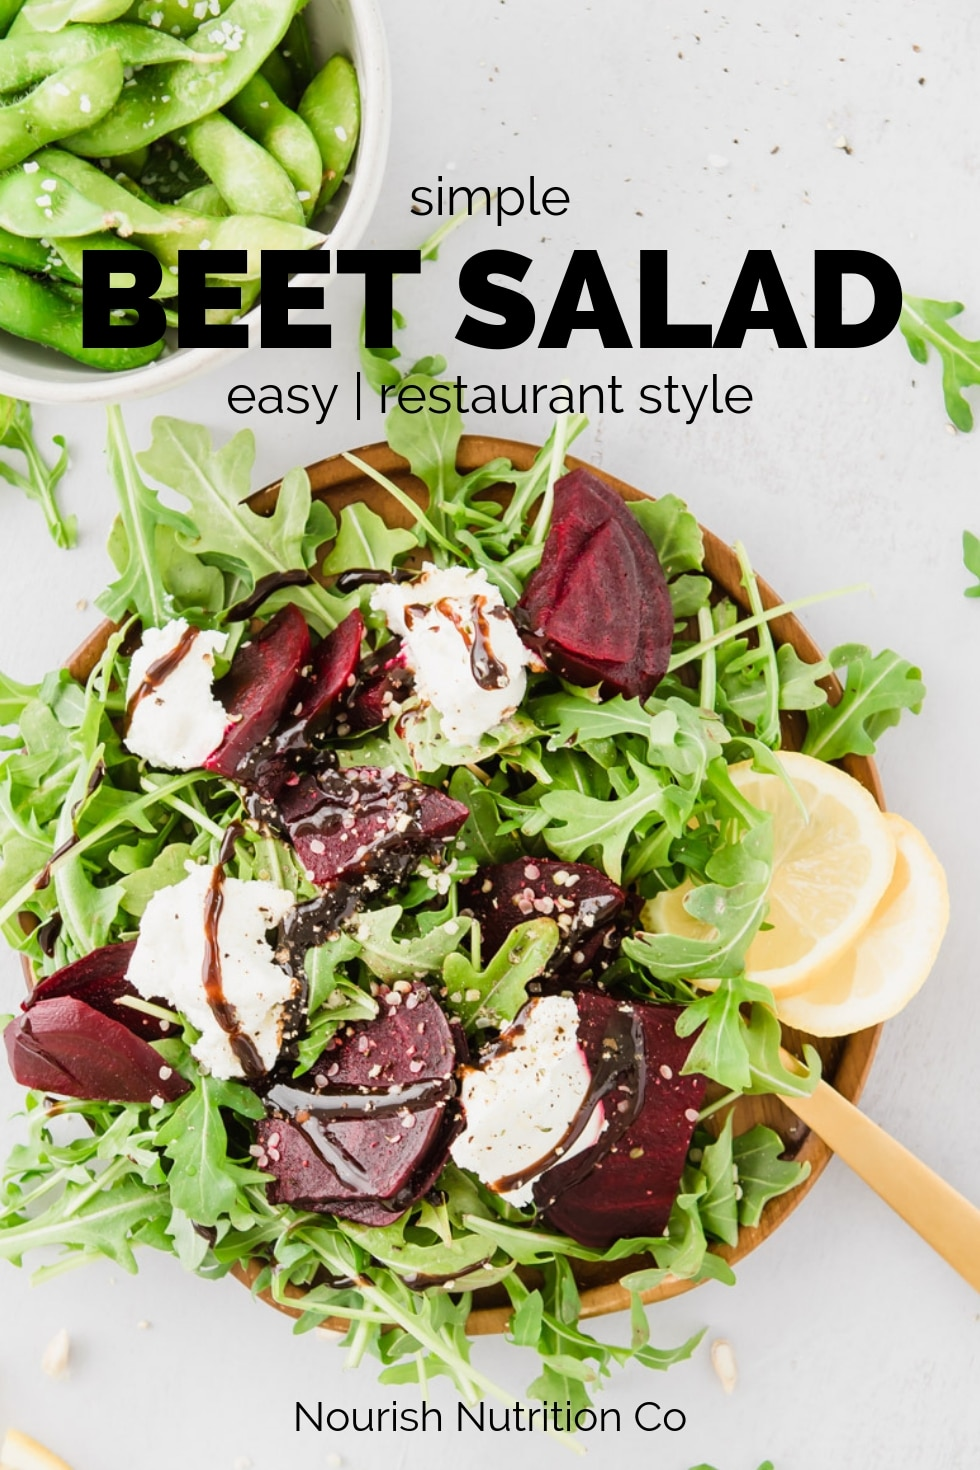 beet and arugula salad with text overlay